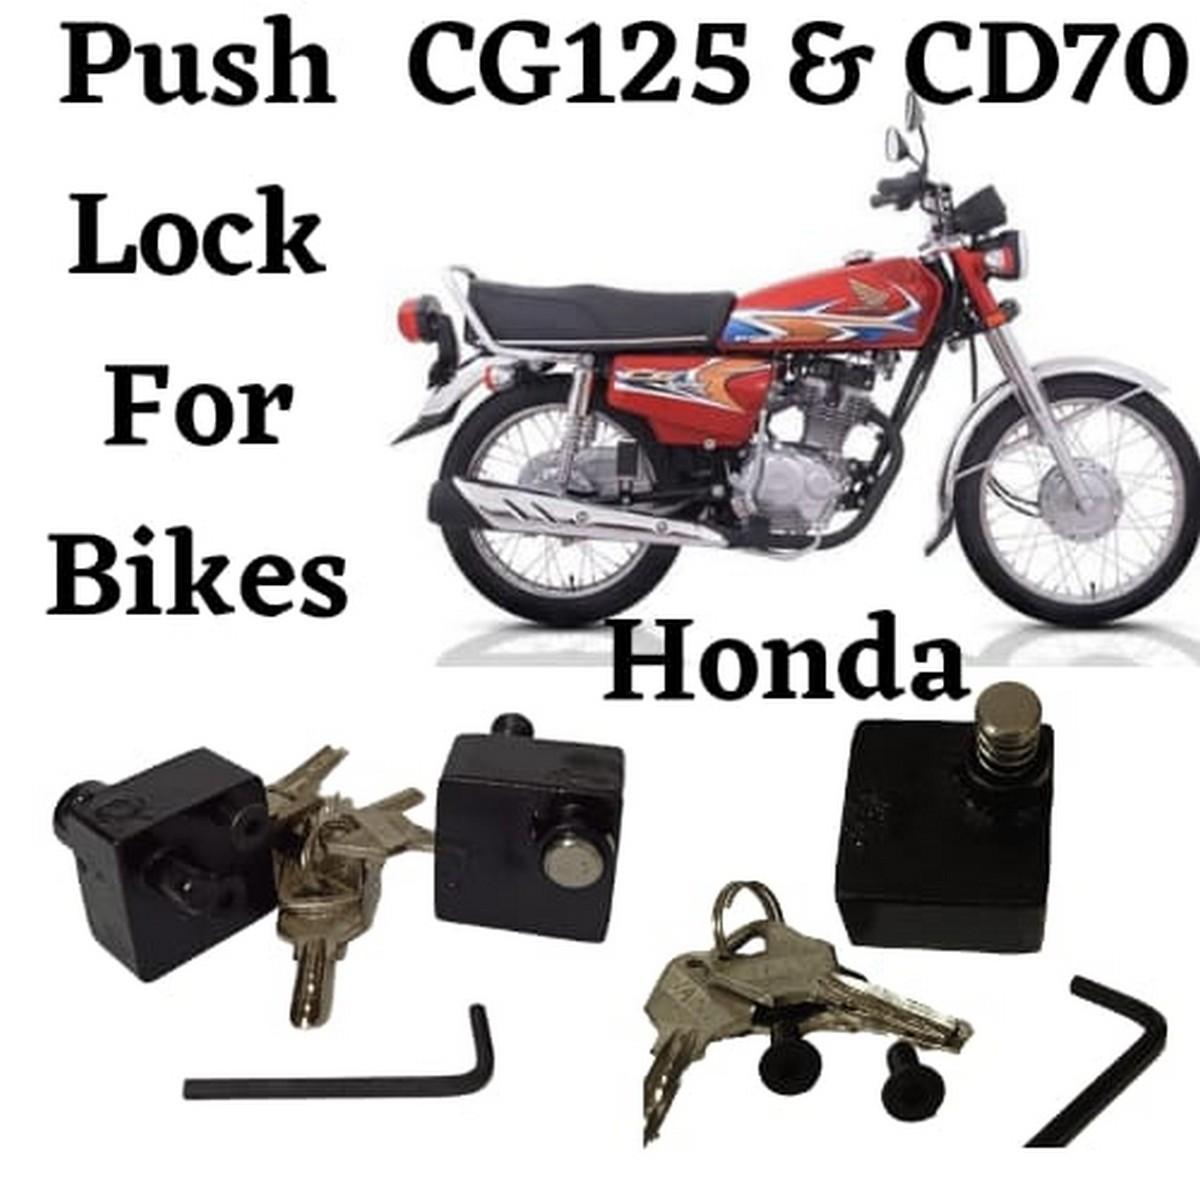 New Bike Lock As Puch Lock